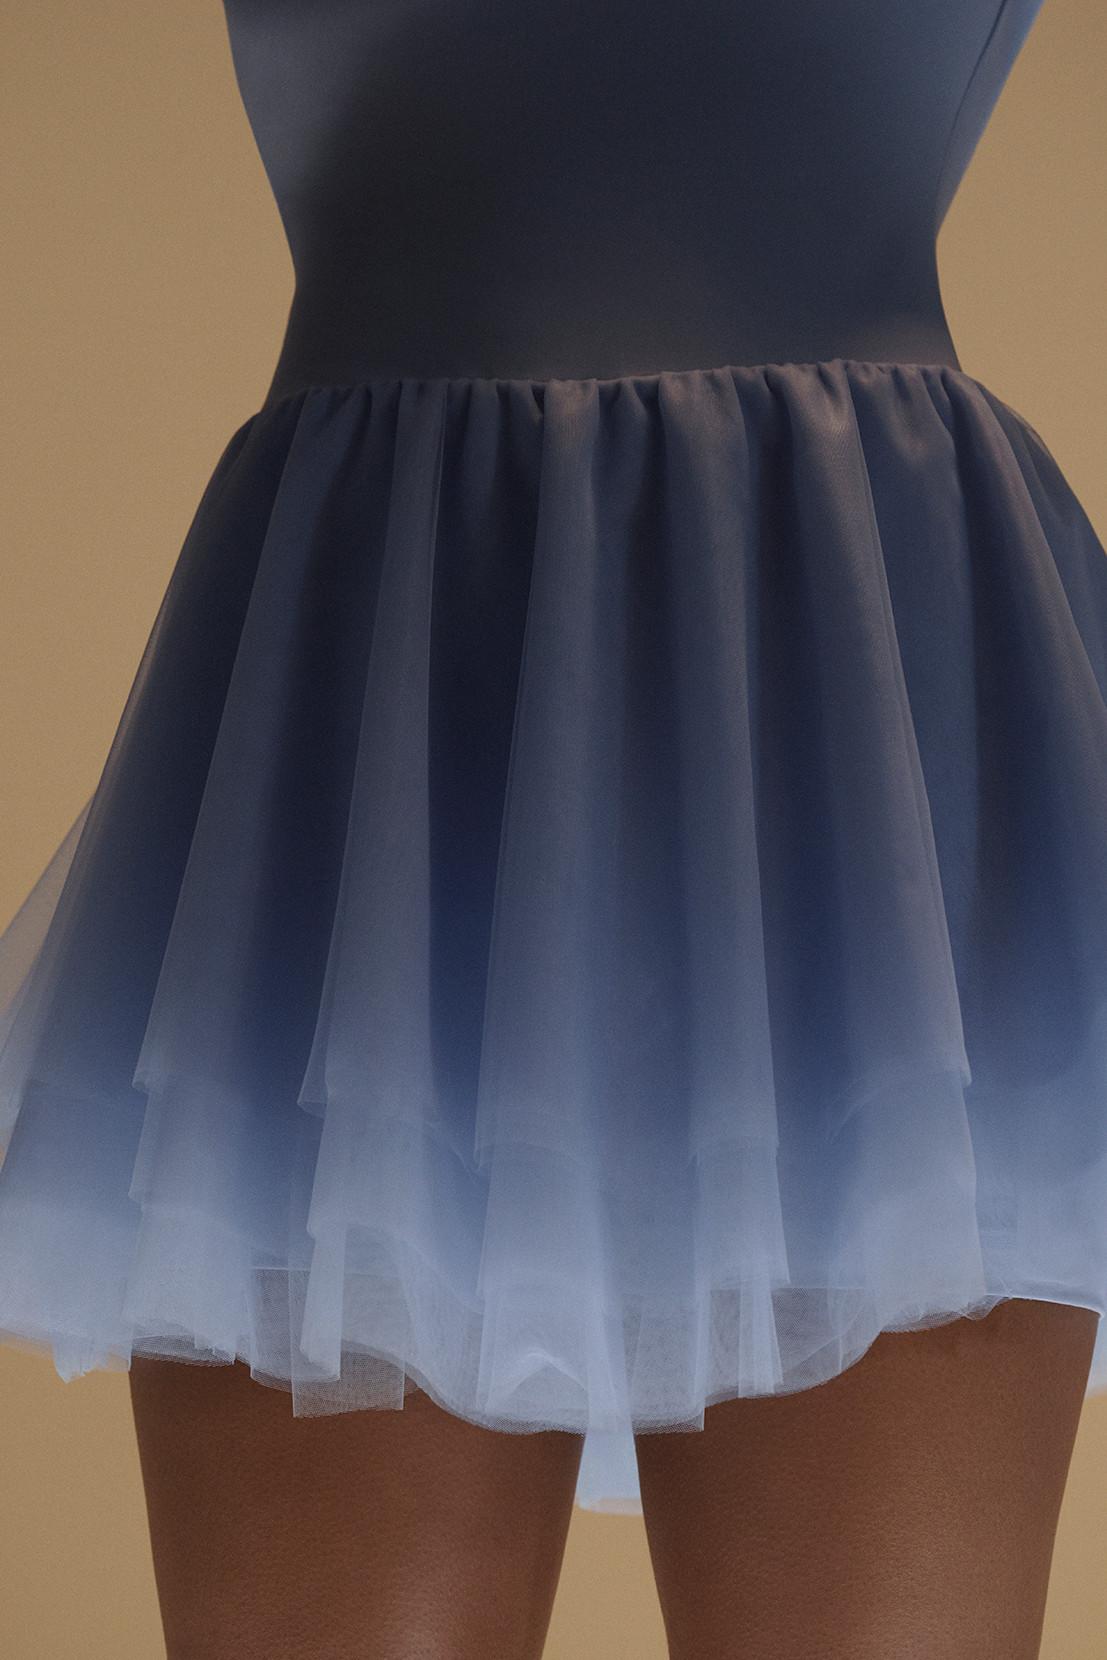 virgil-abloh-serena-williams-nike-queen-collab-details-4